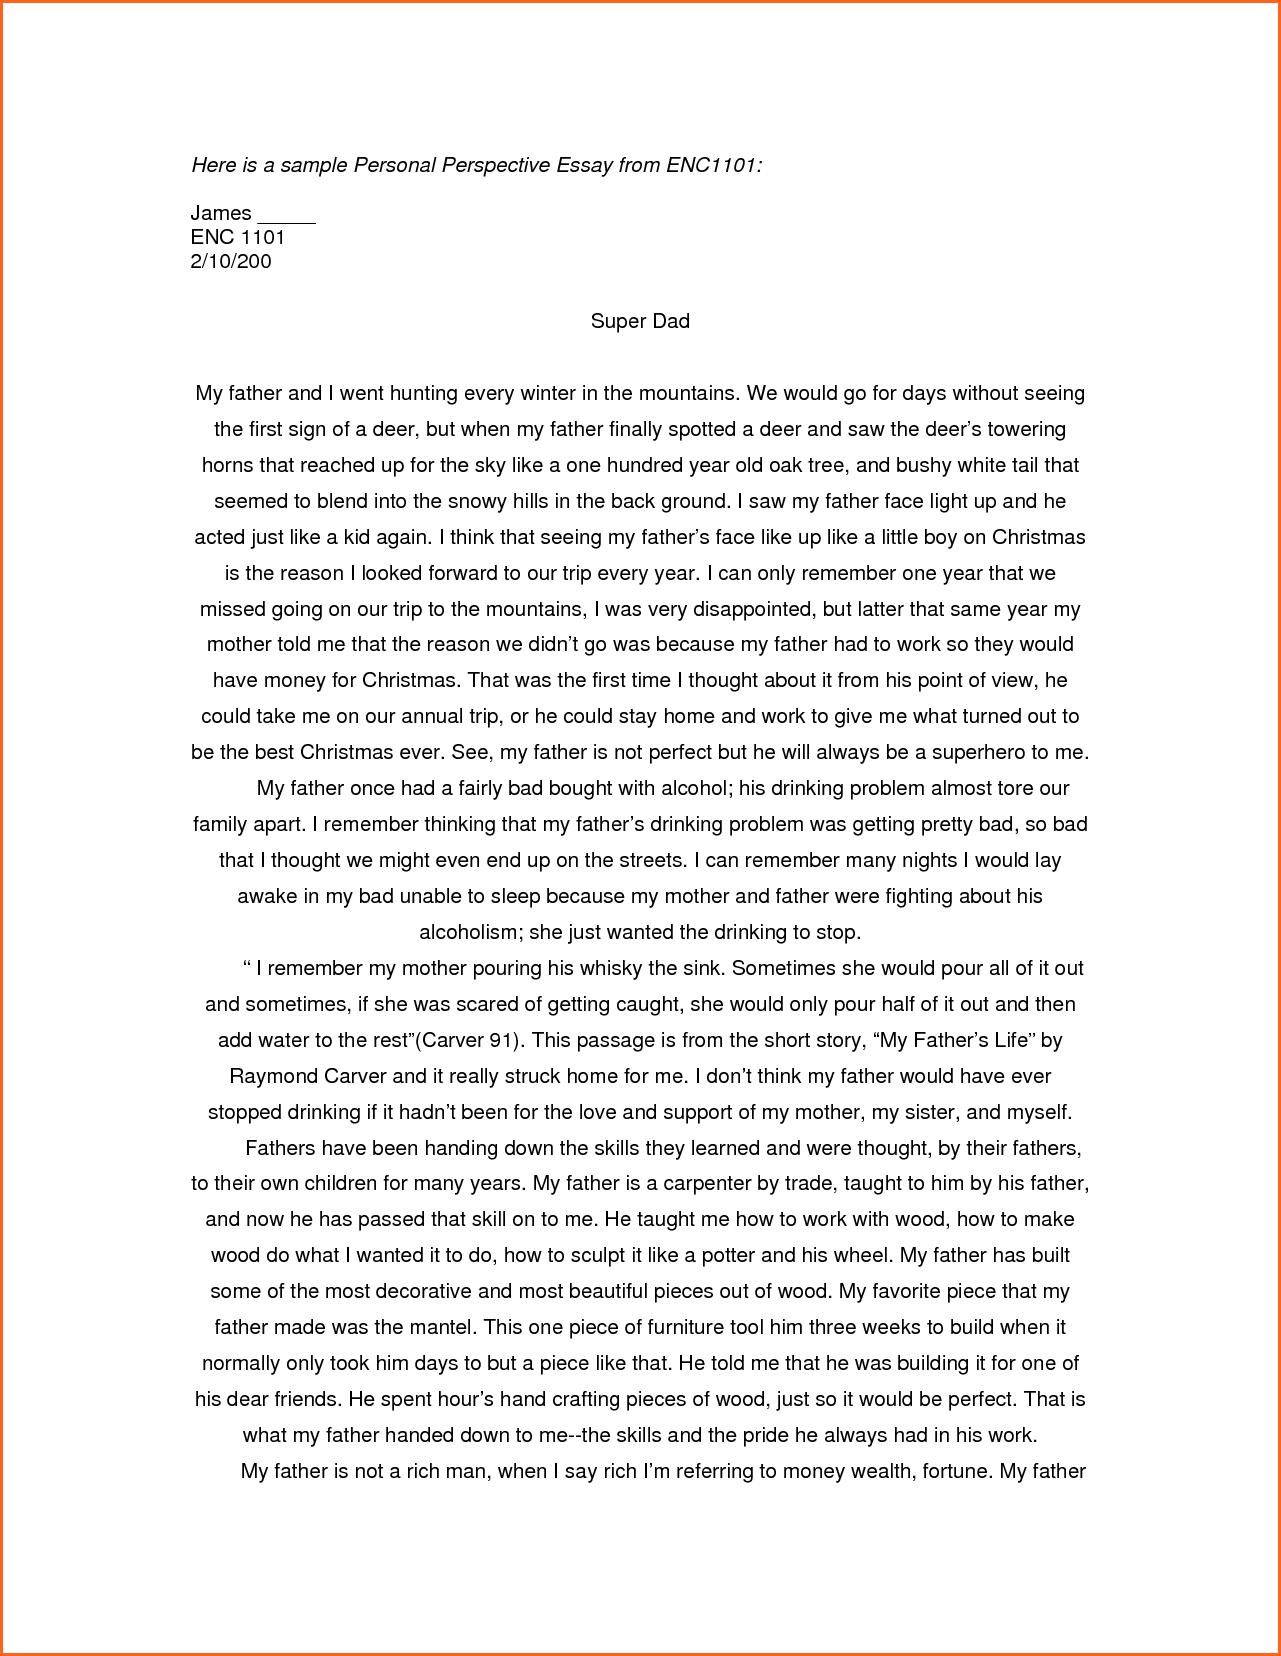 Essay as form